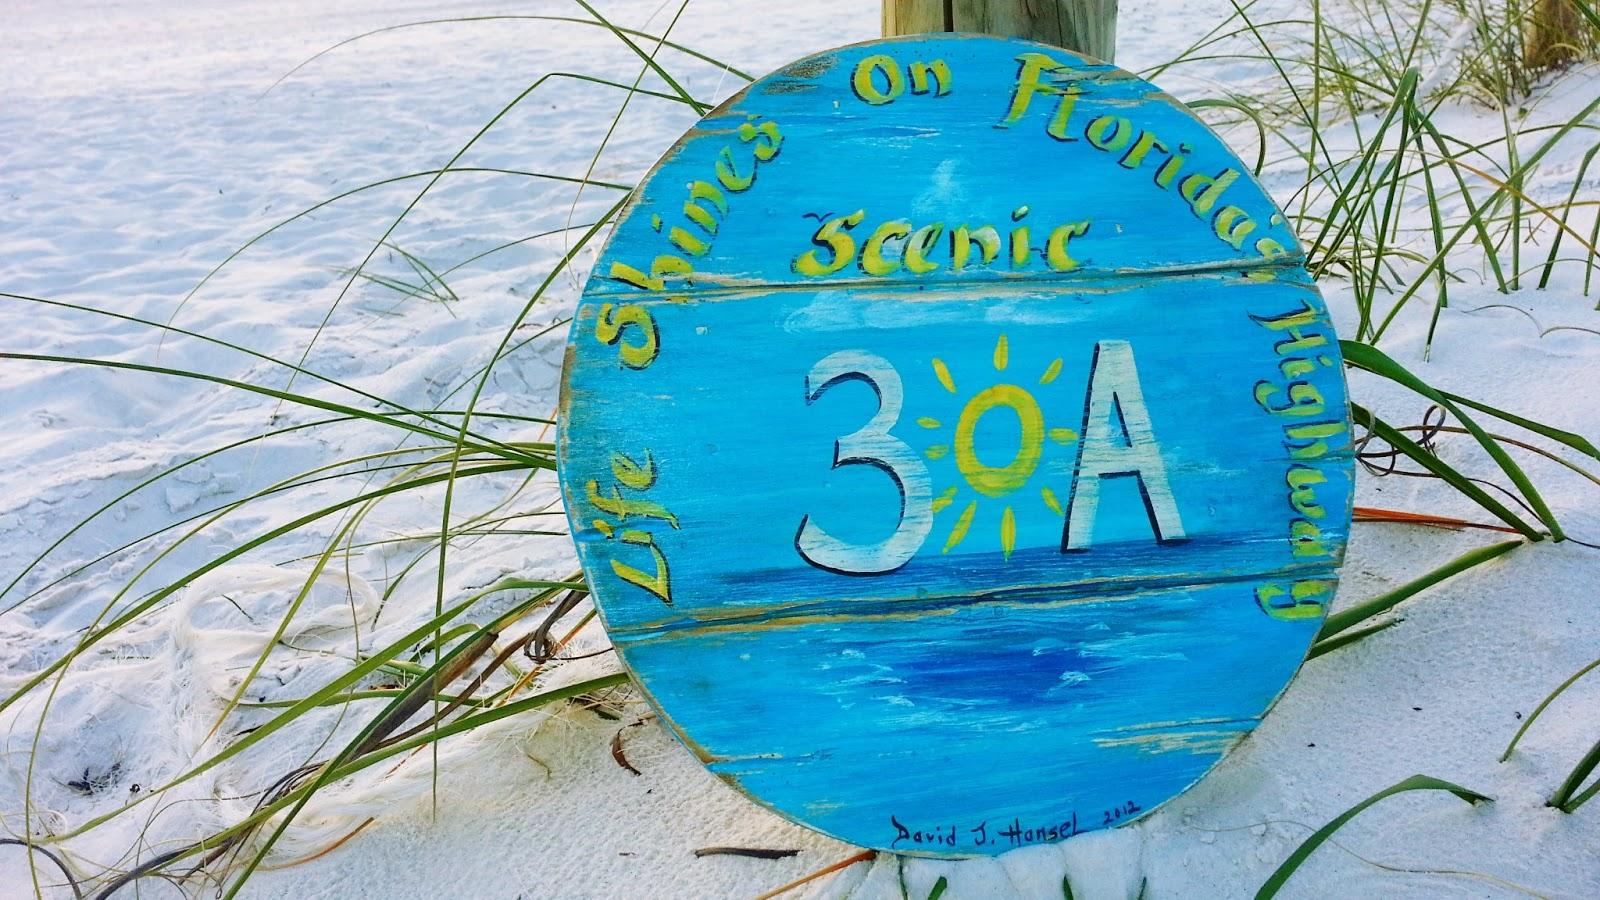 David J Hansel The Artist 30a Vintage Beach Sign Order